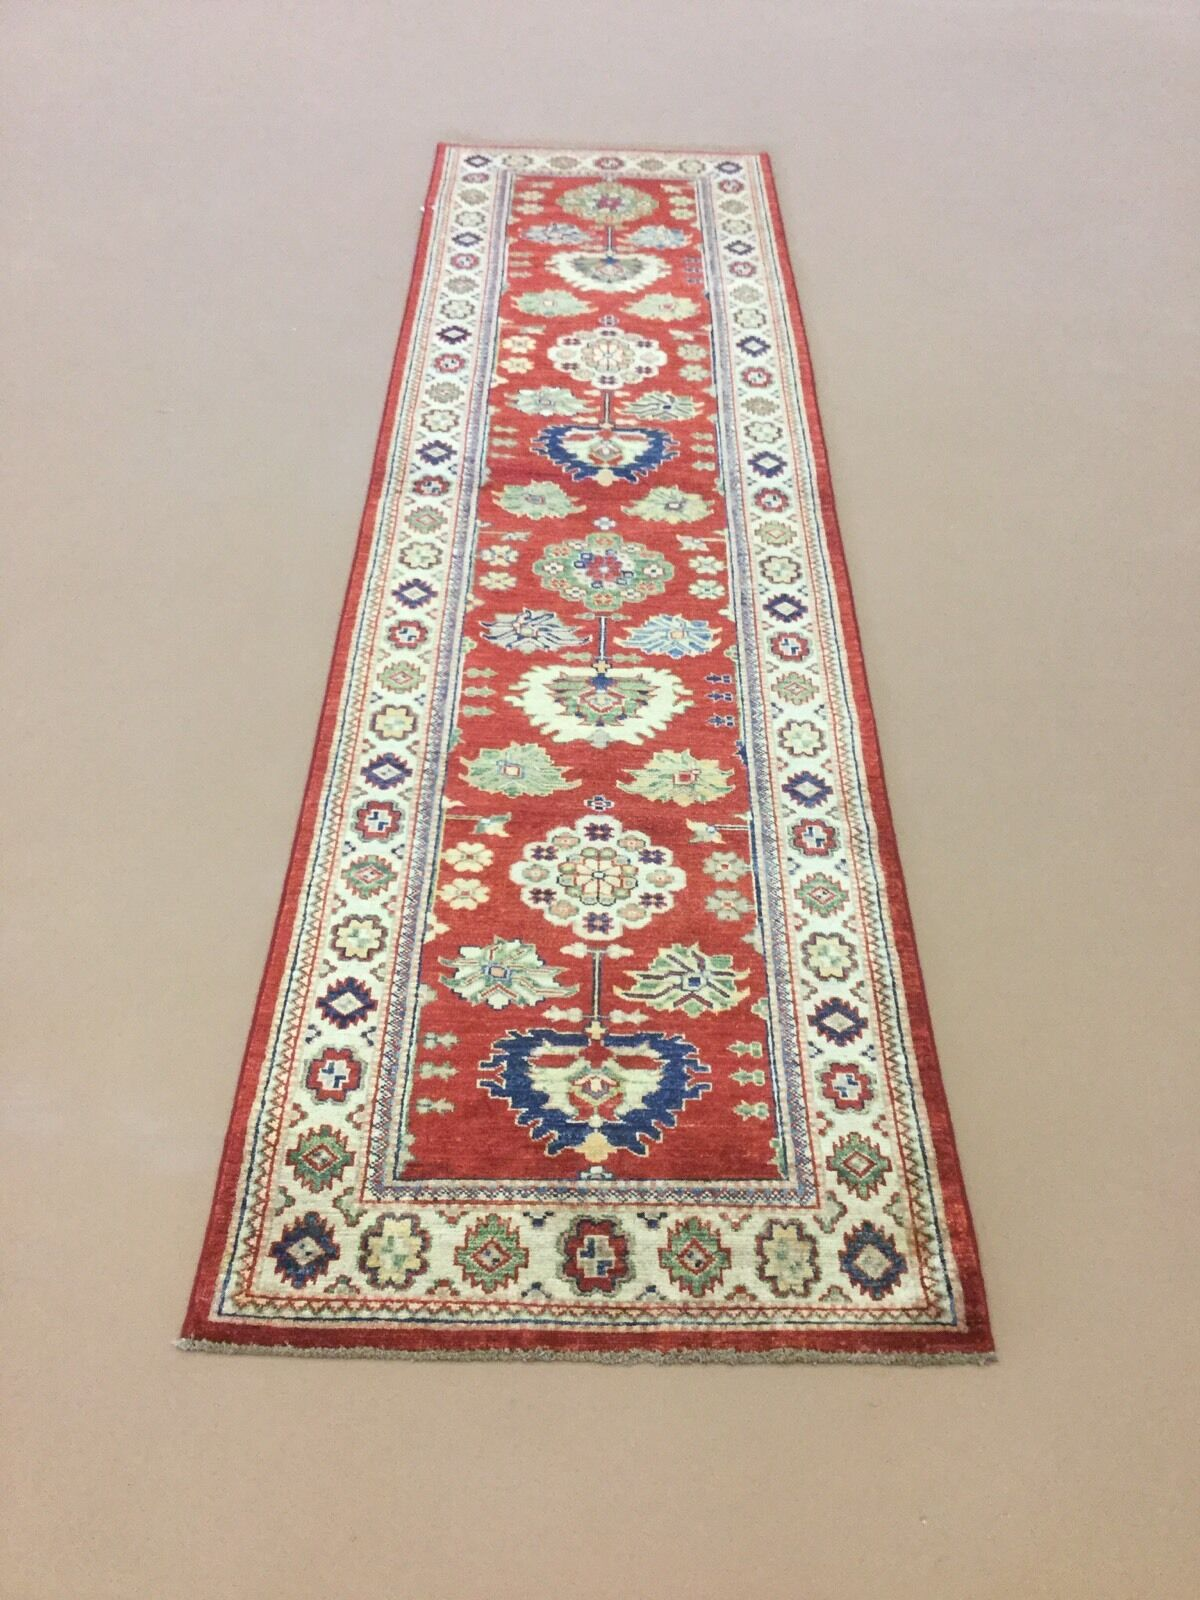 2'.7  X 9'.9  Rosa Beige Super Super Super Kazak Persian Oriental Rug Runner Hand Knotted d4e614